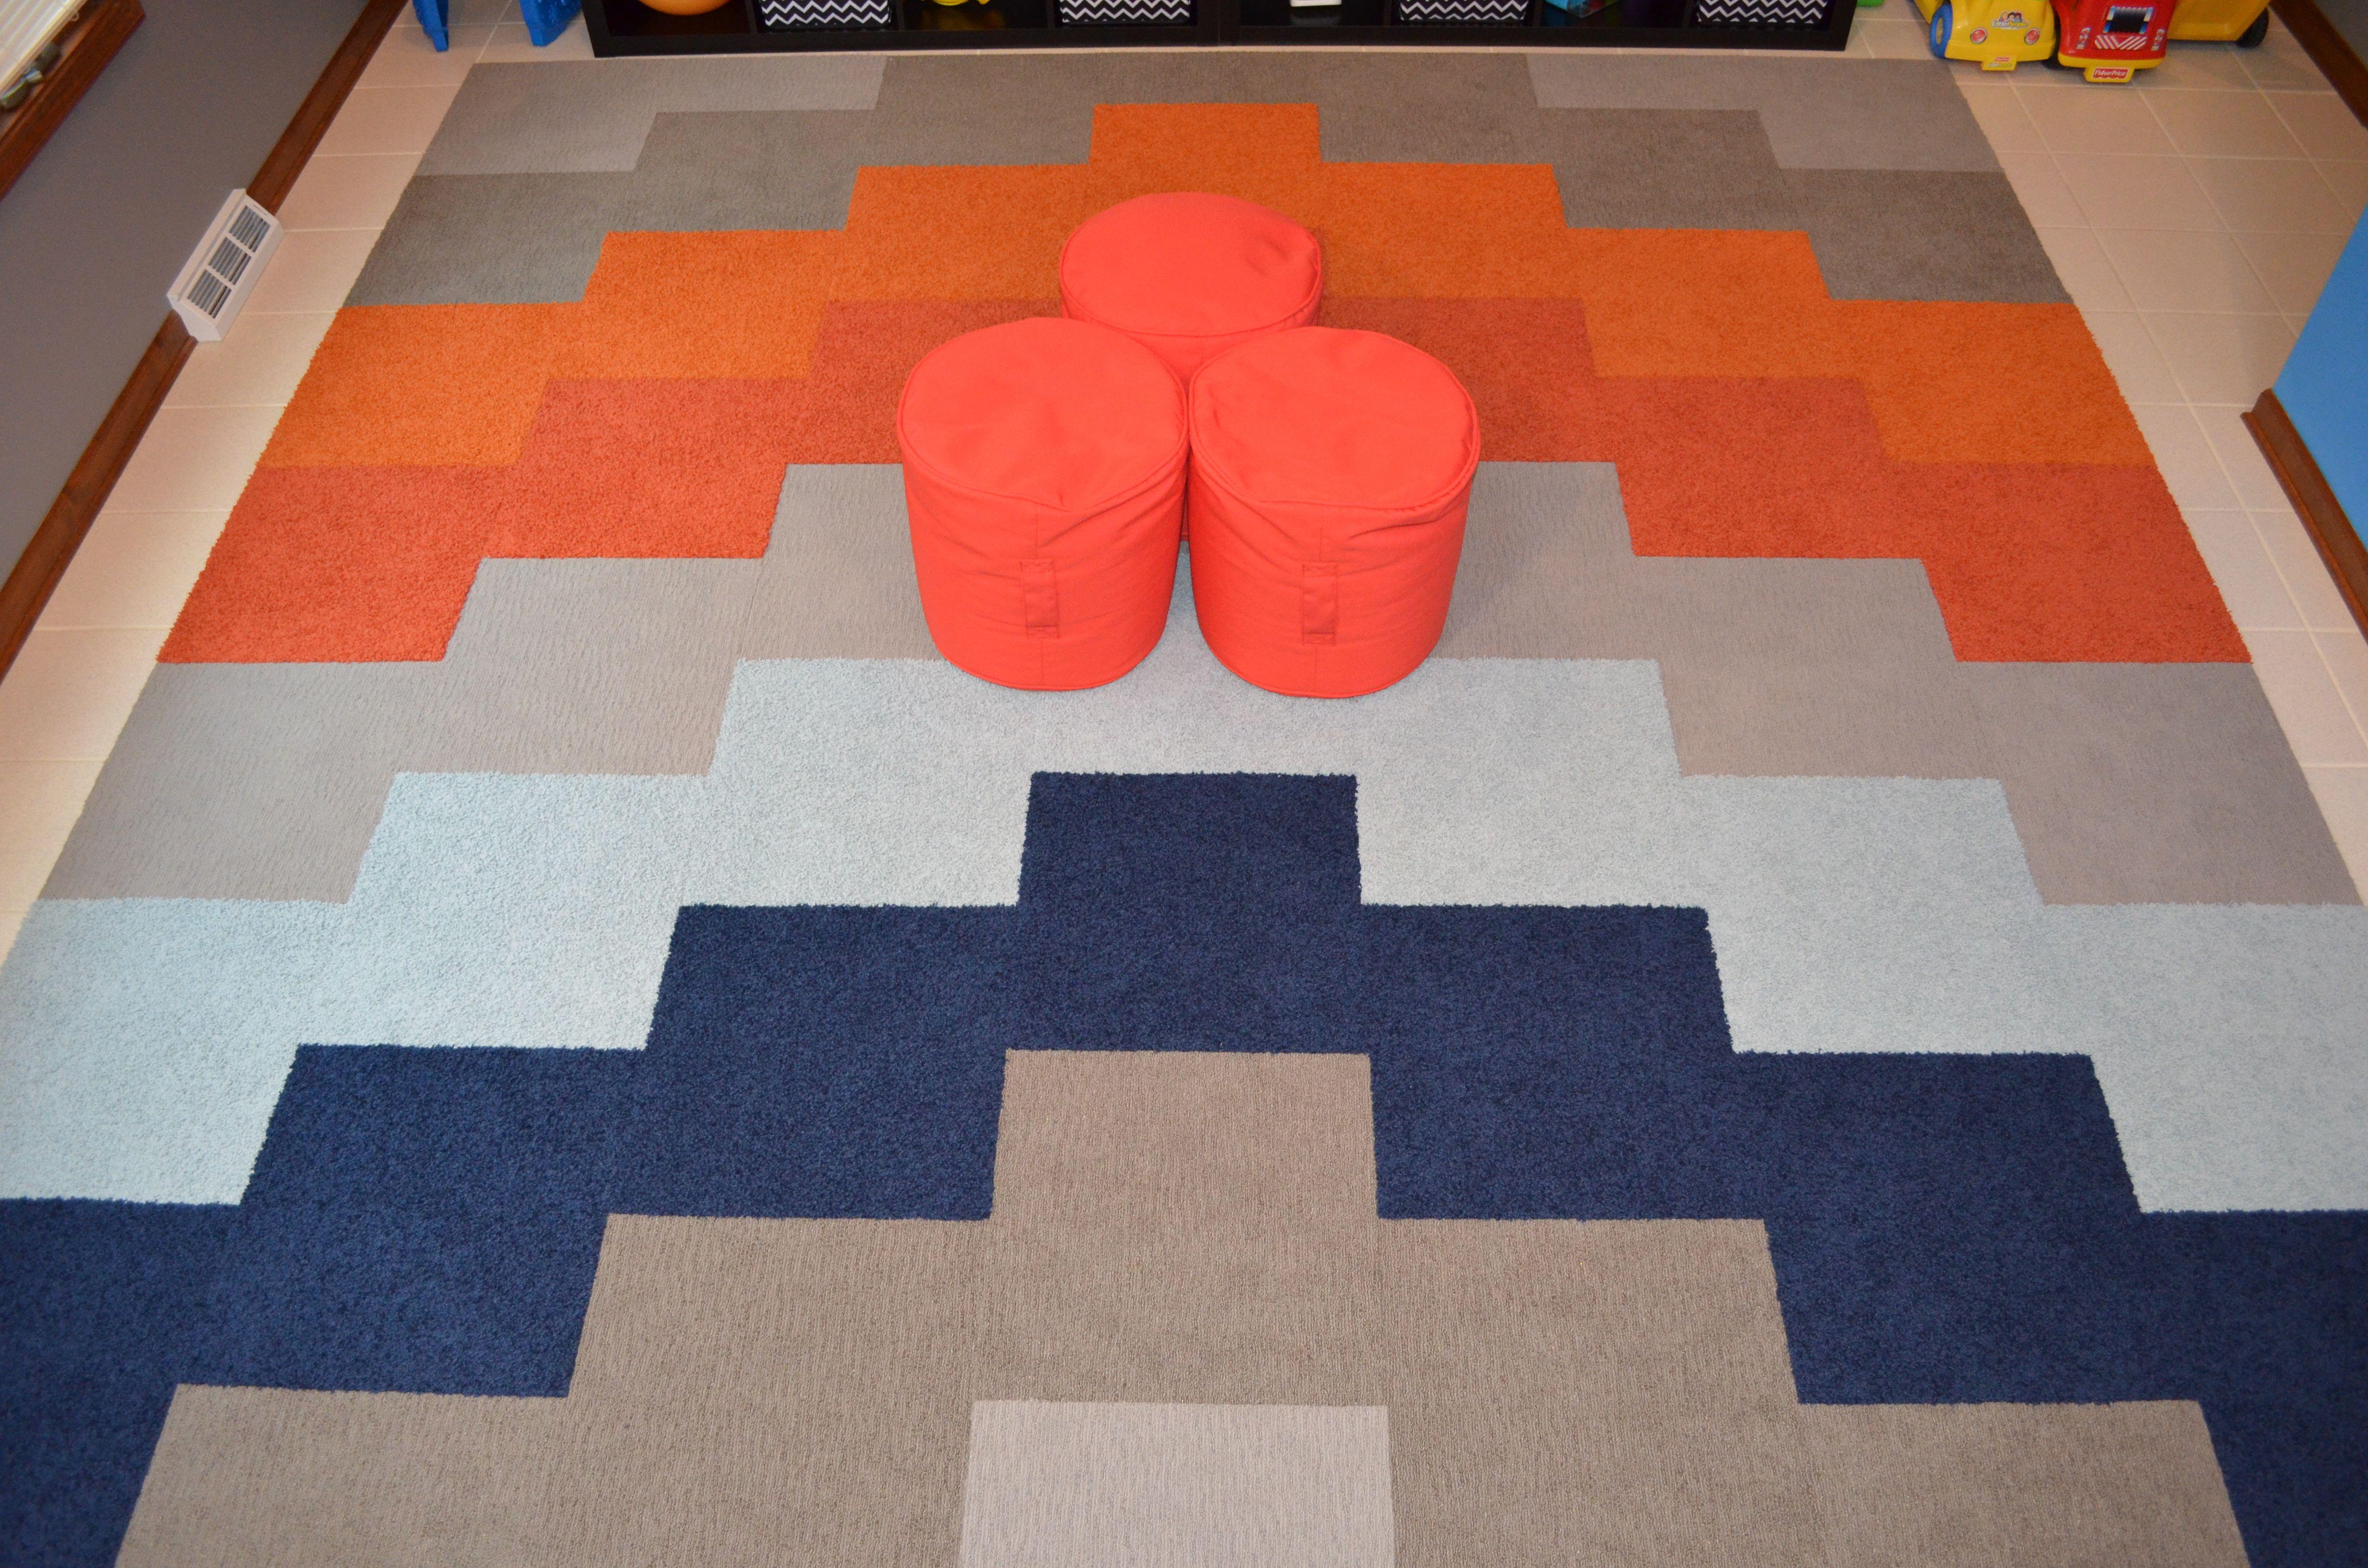 Carpet Tile Installation Is Very Easy Carpet Tiles Rugs On